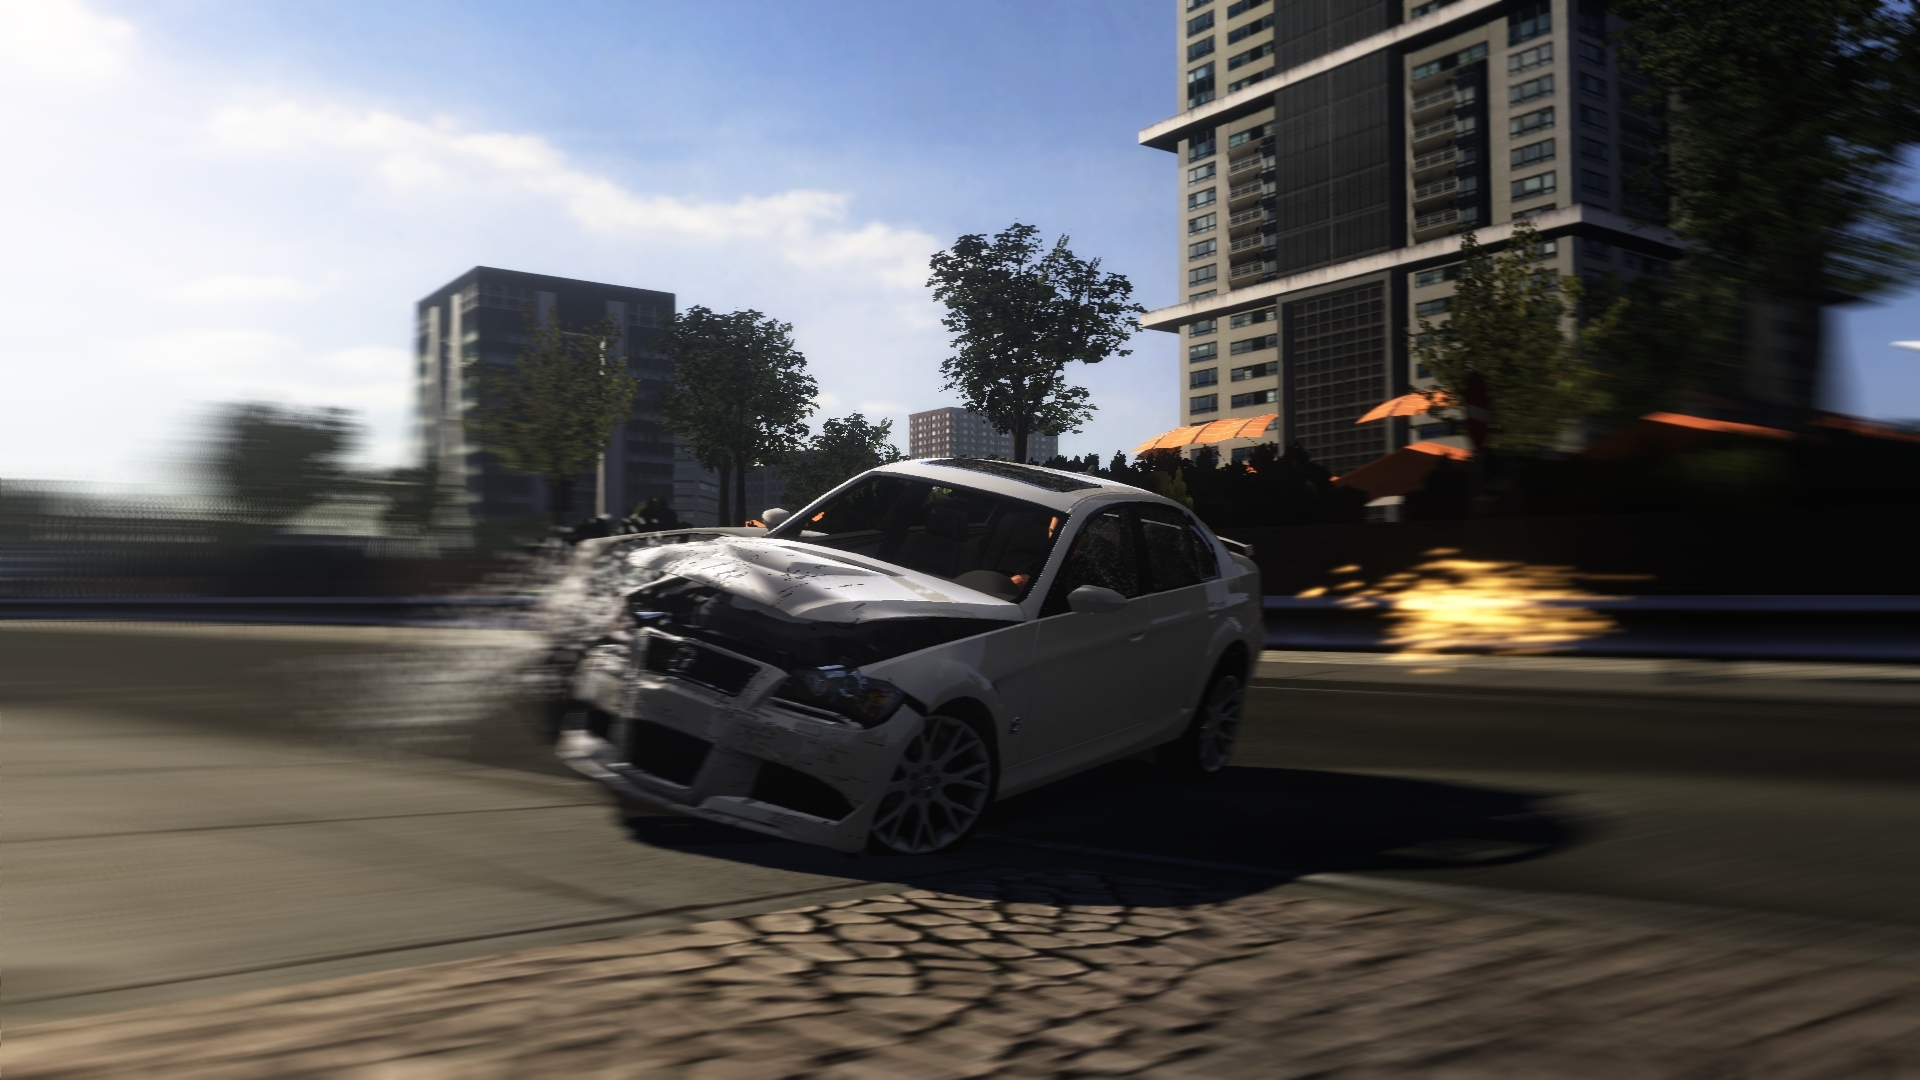 cobra 11 crash time 5 download